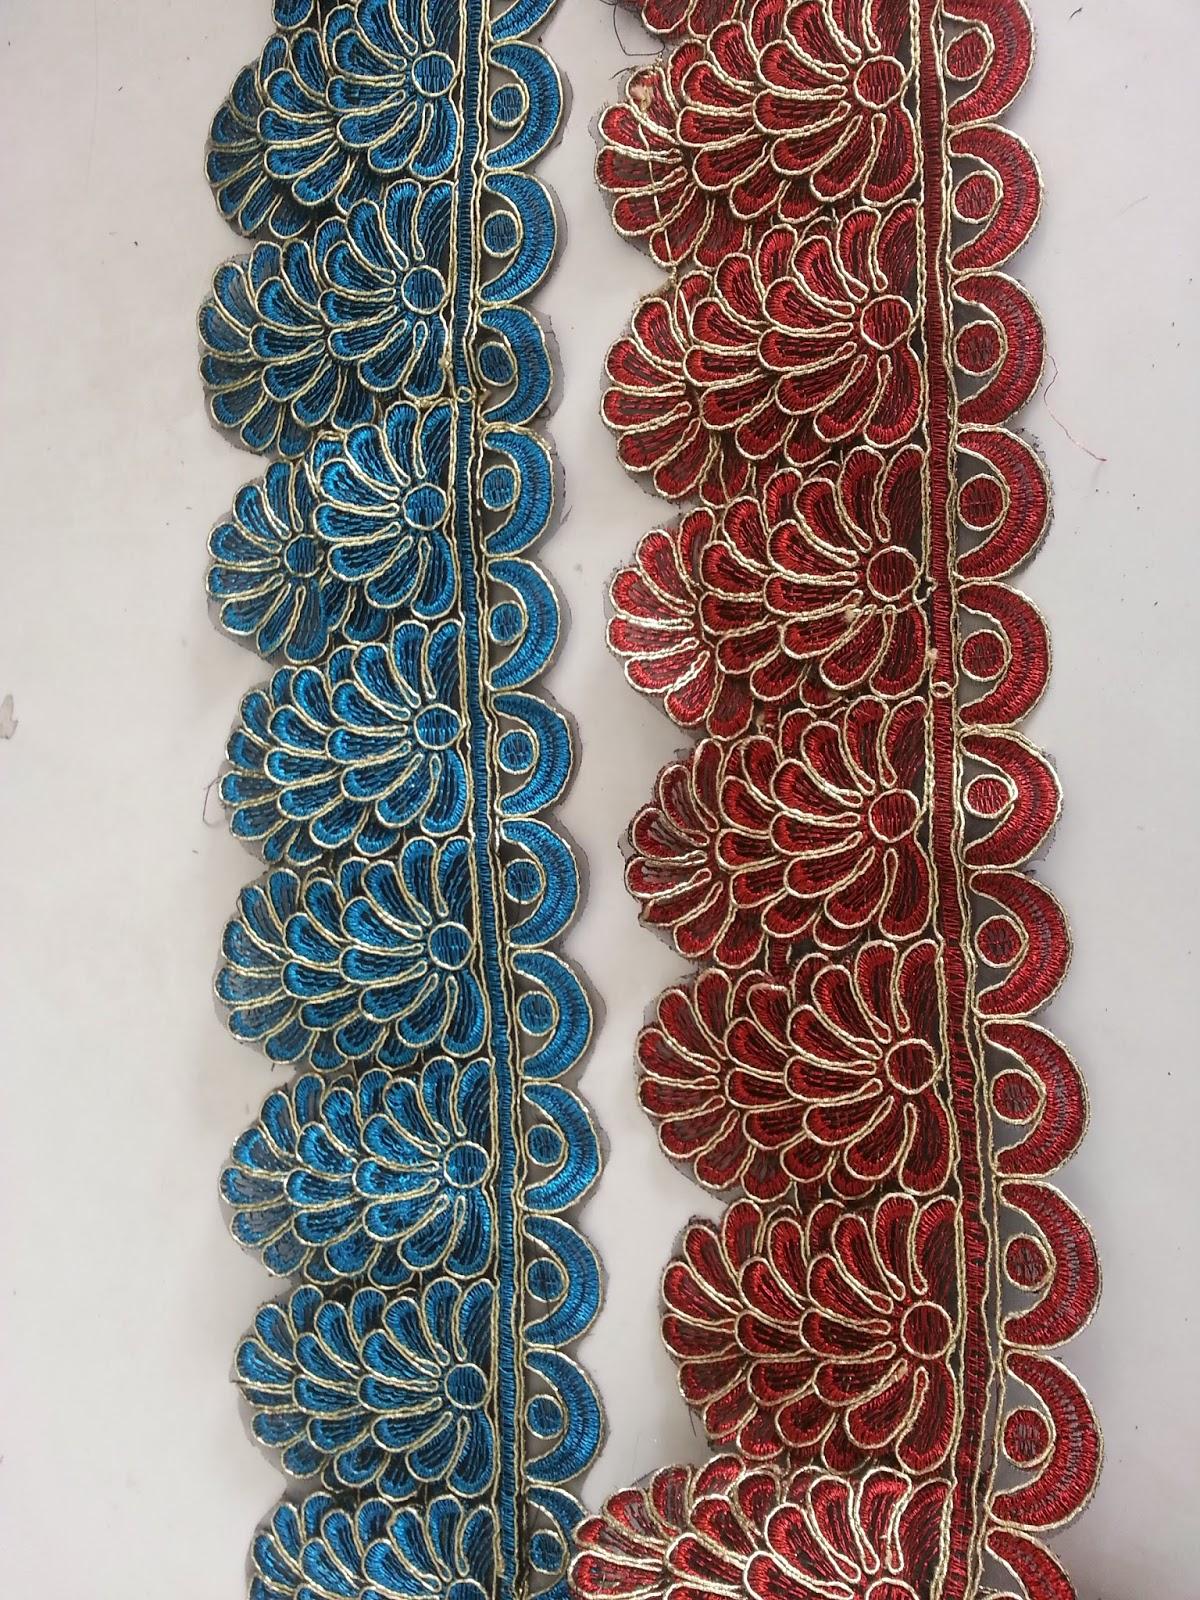 Kedai Jahit Shah Alam Seksyen 13 Soalan 81